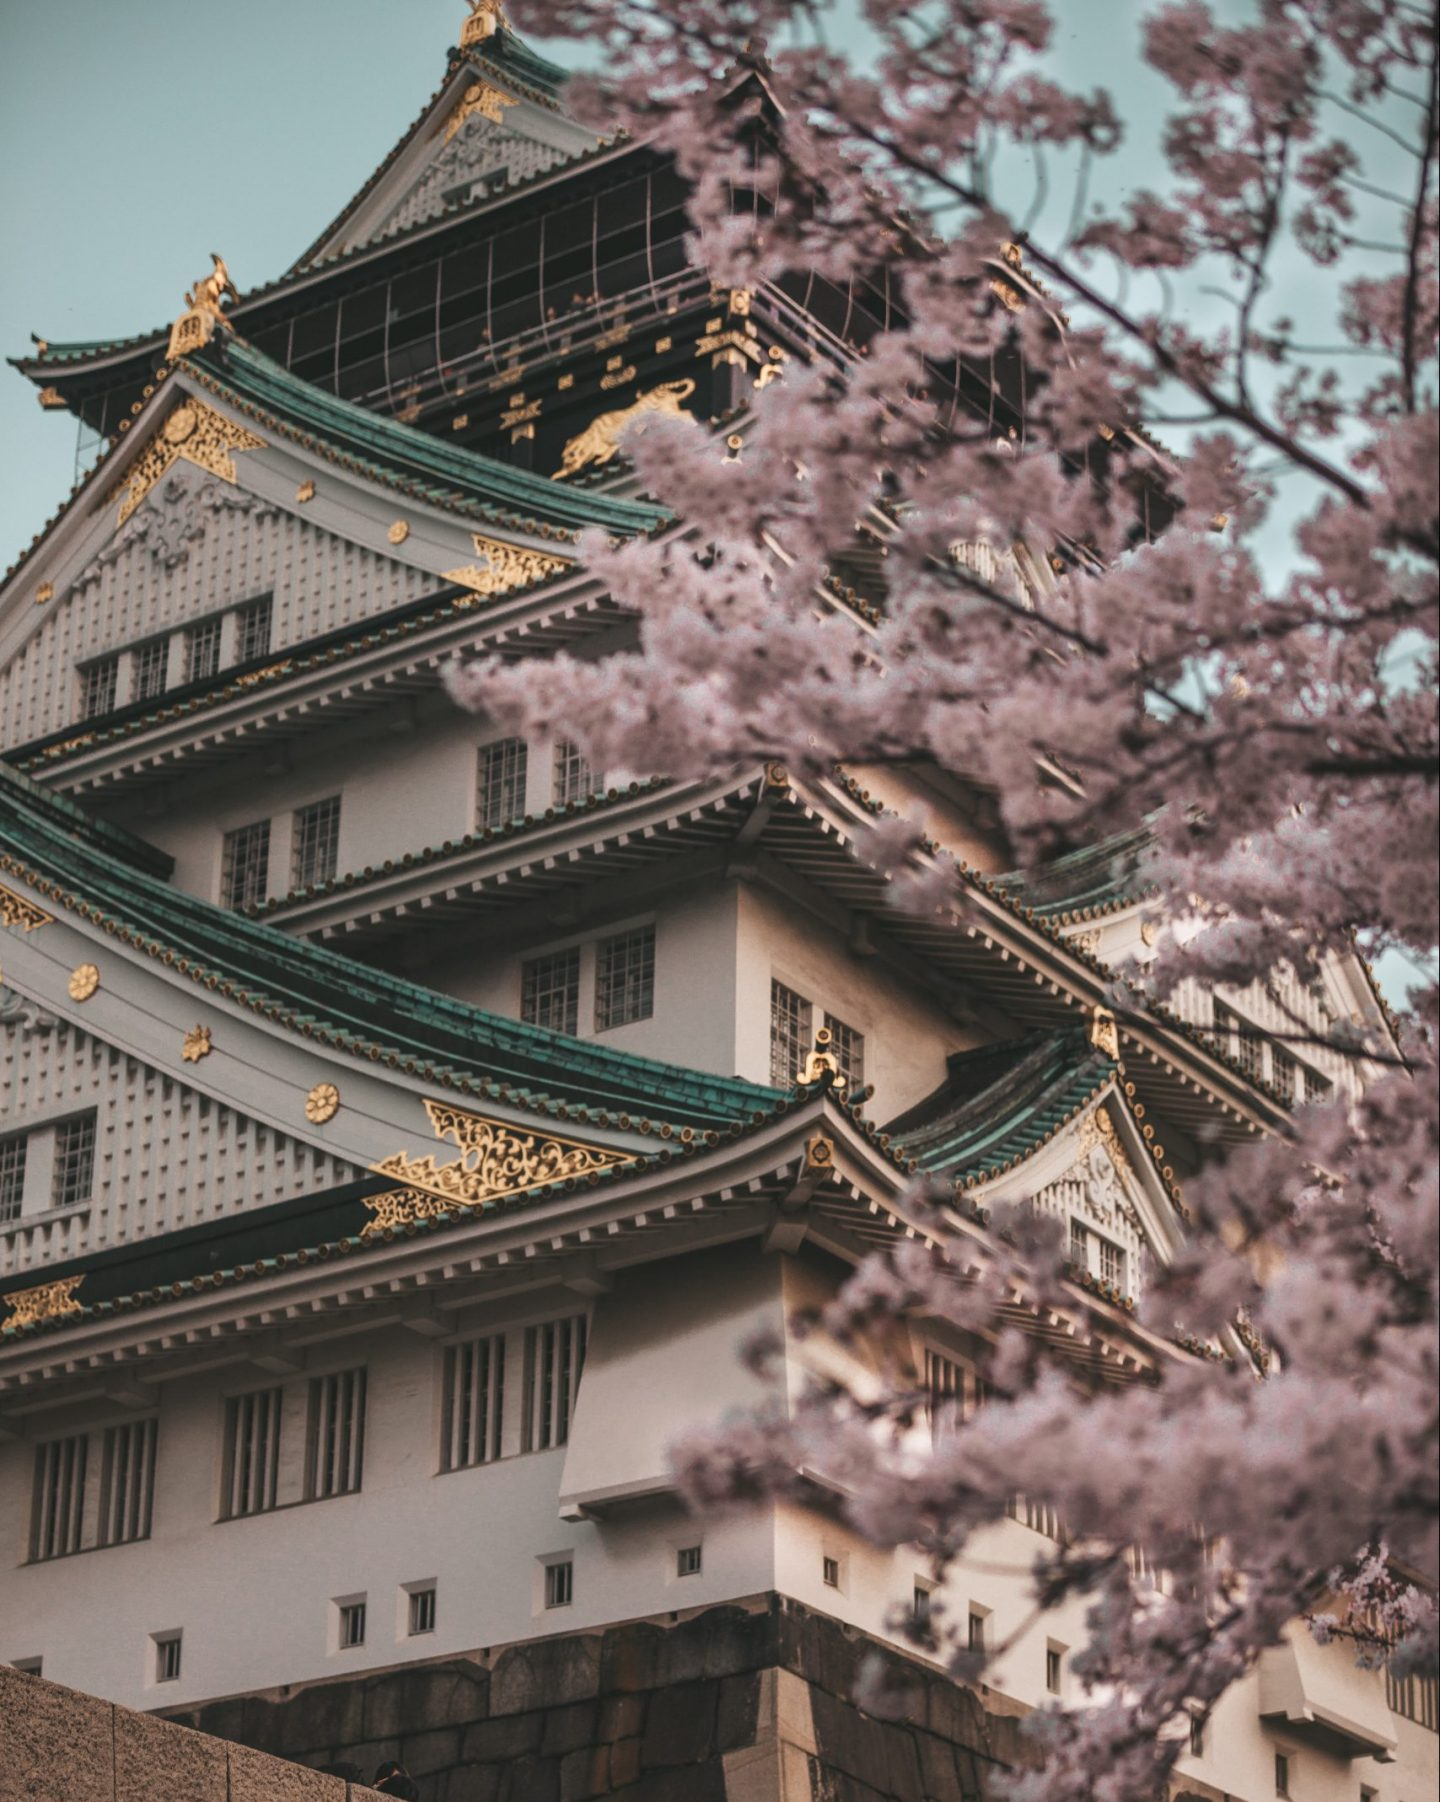 osaka castle during cherry blossom season